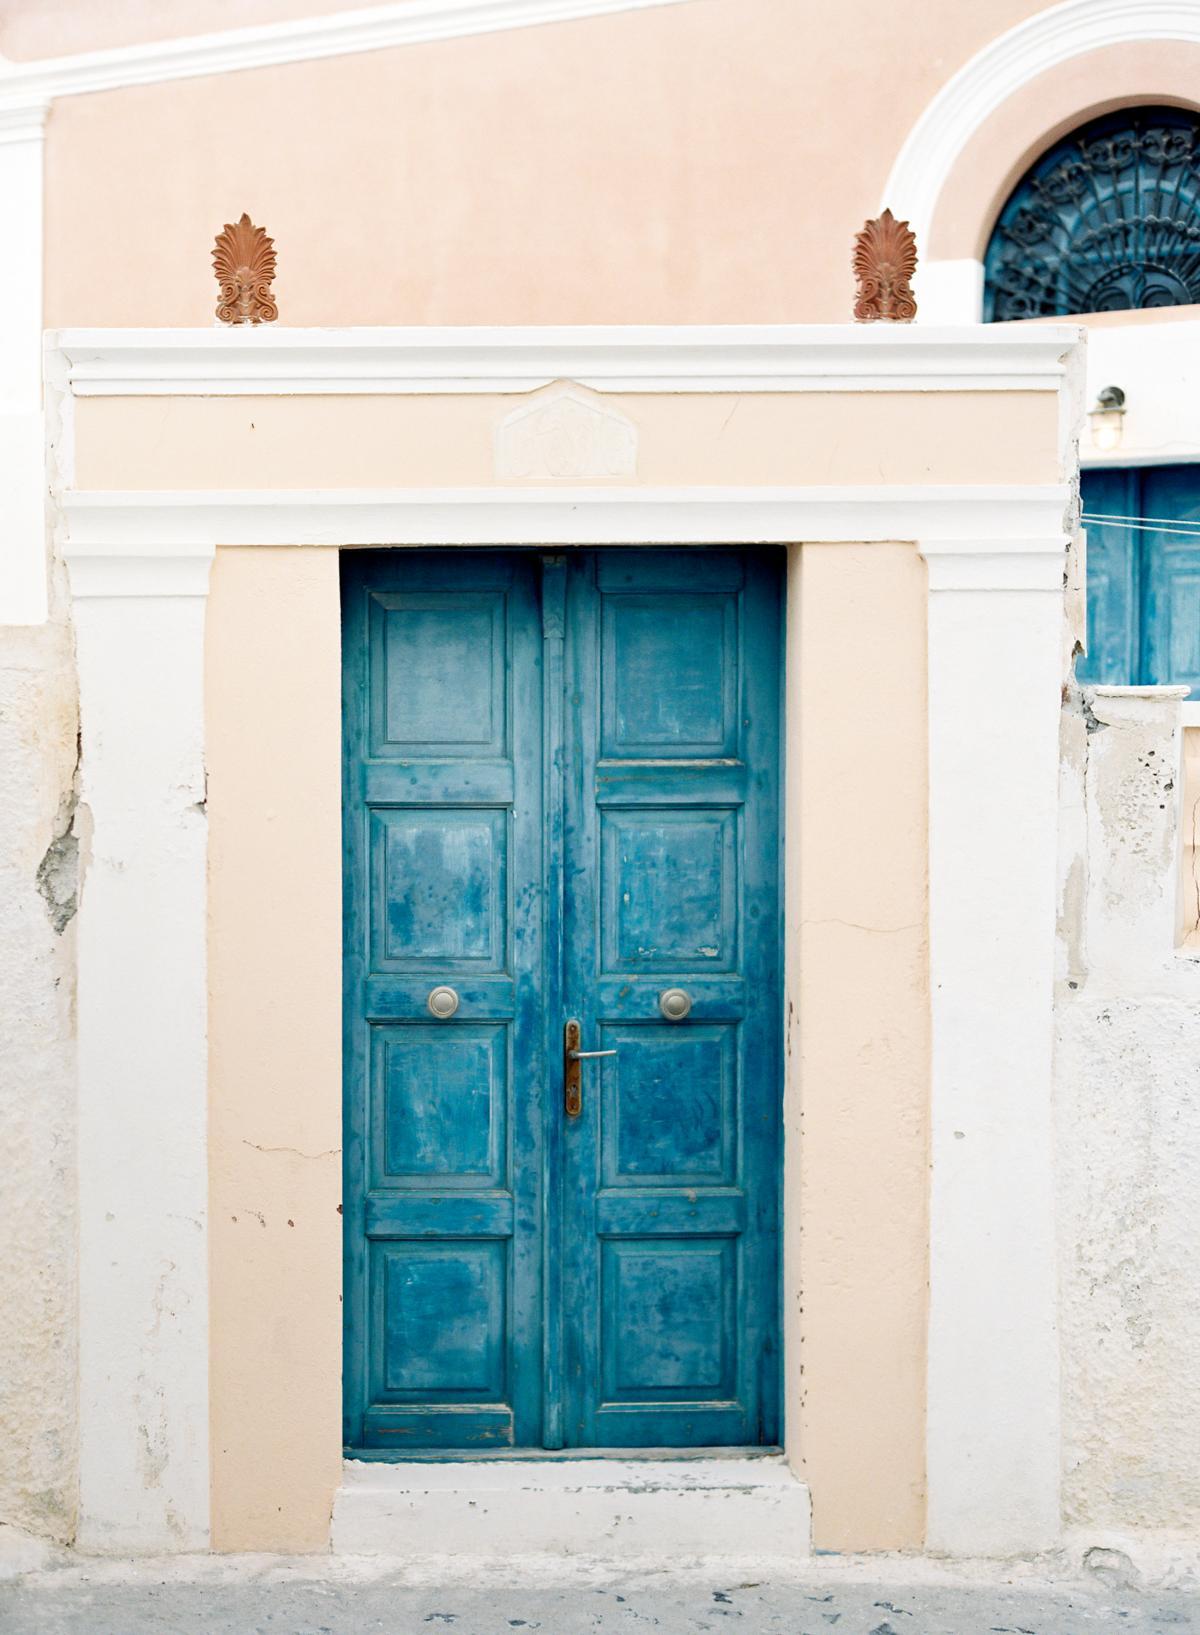 Santorini greece travel photos by omalley photographers 0003